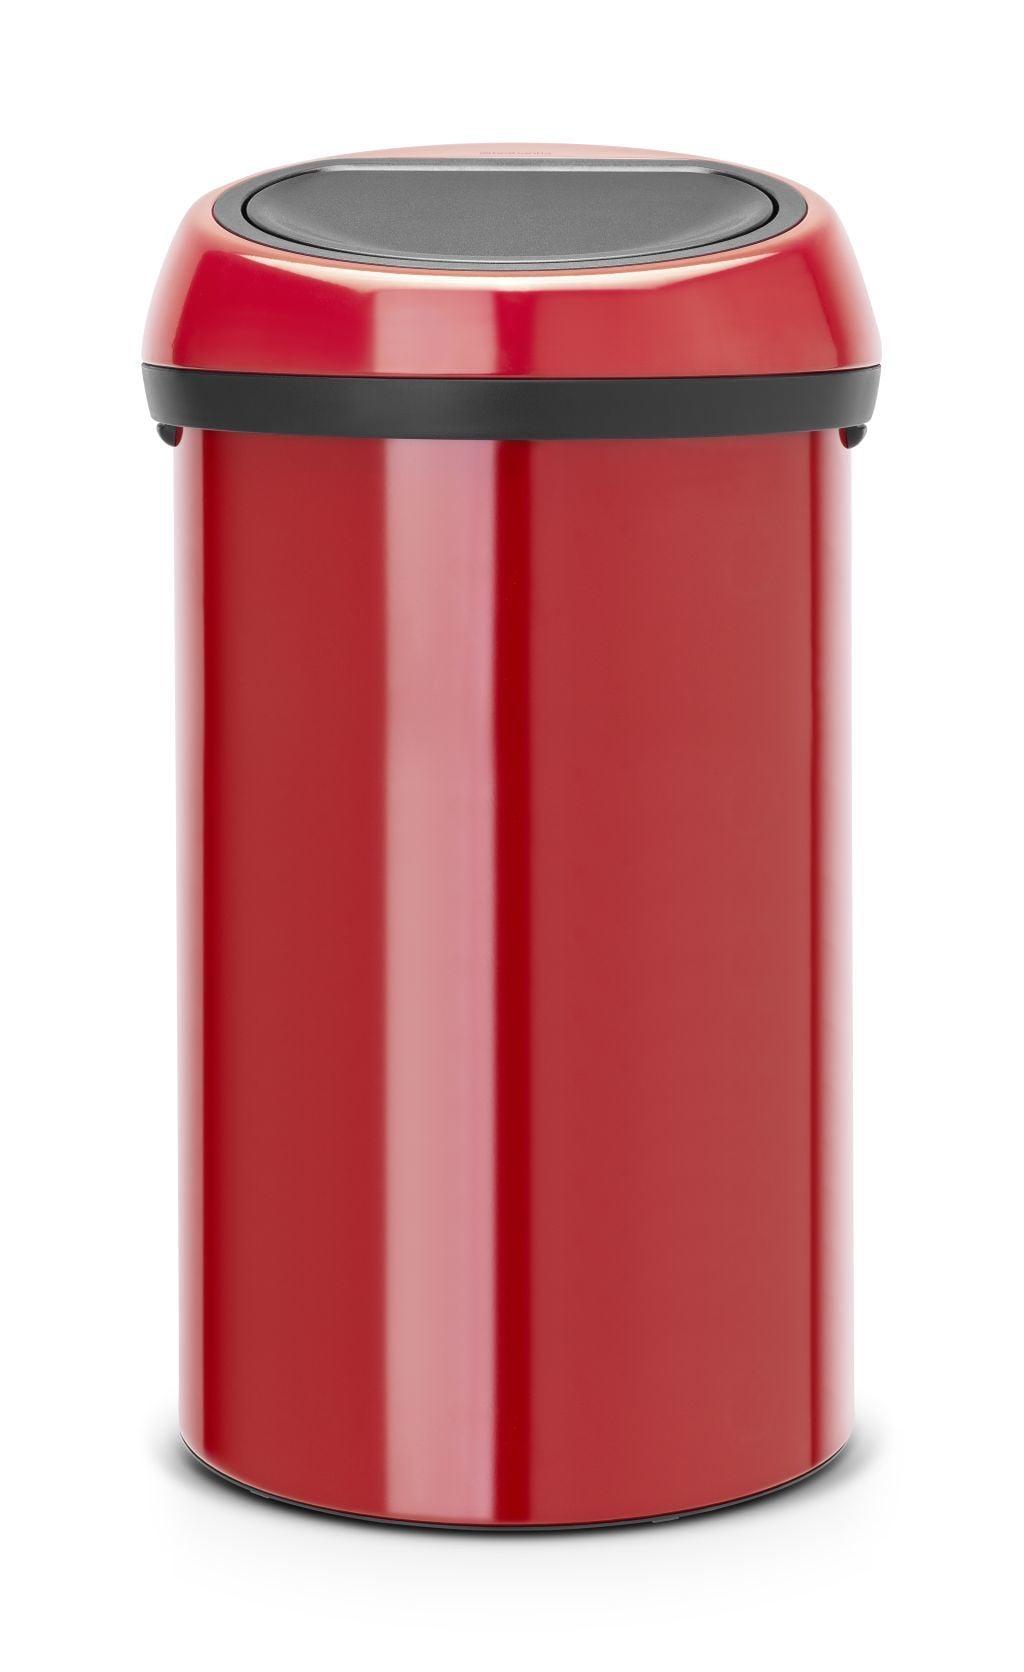 Aanbieding Brabantia Touch Bin 30 Ltr.Aanbieding Brabantia Touch Bin 60 Liter Passion Red Brabantia Met